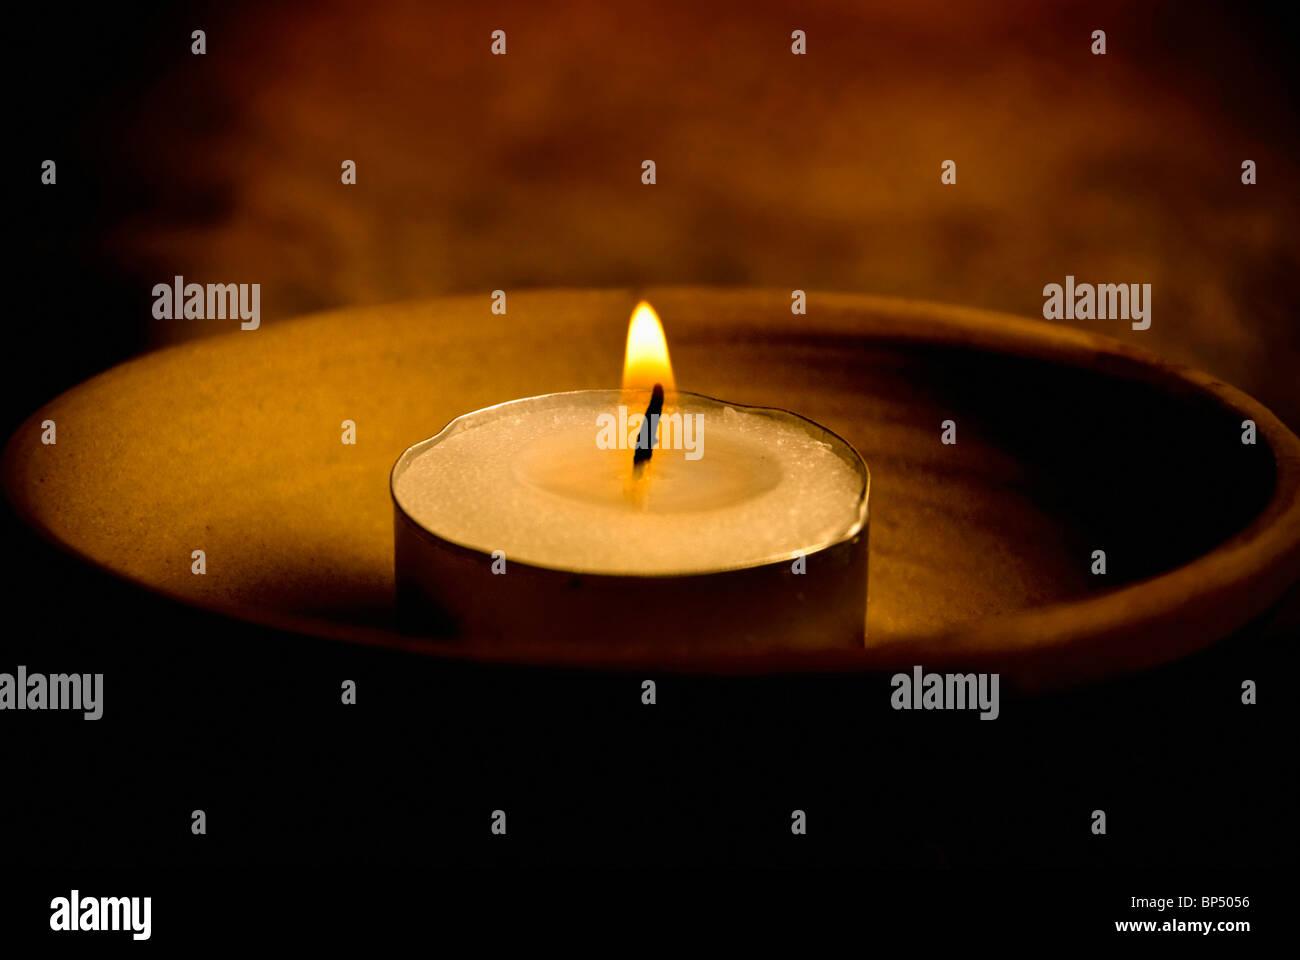 candle for magic ritual - Stock Image